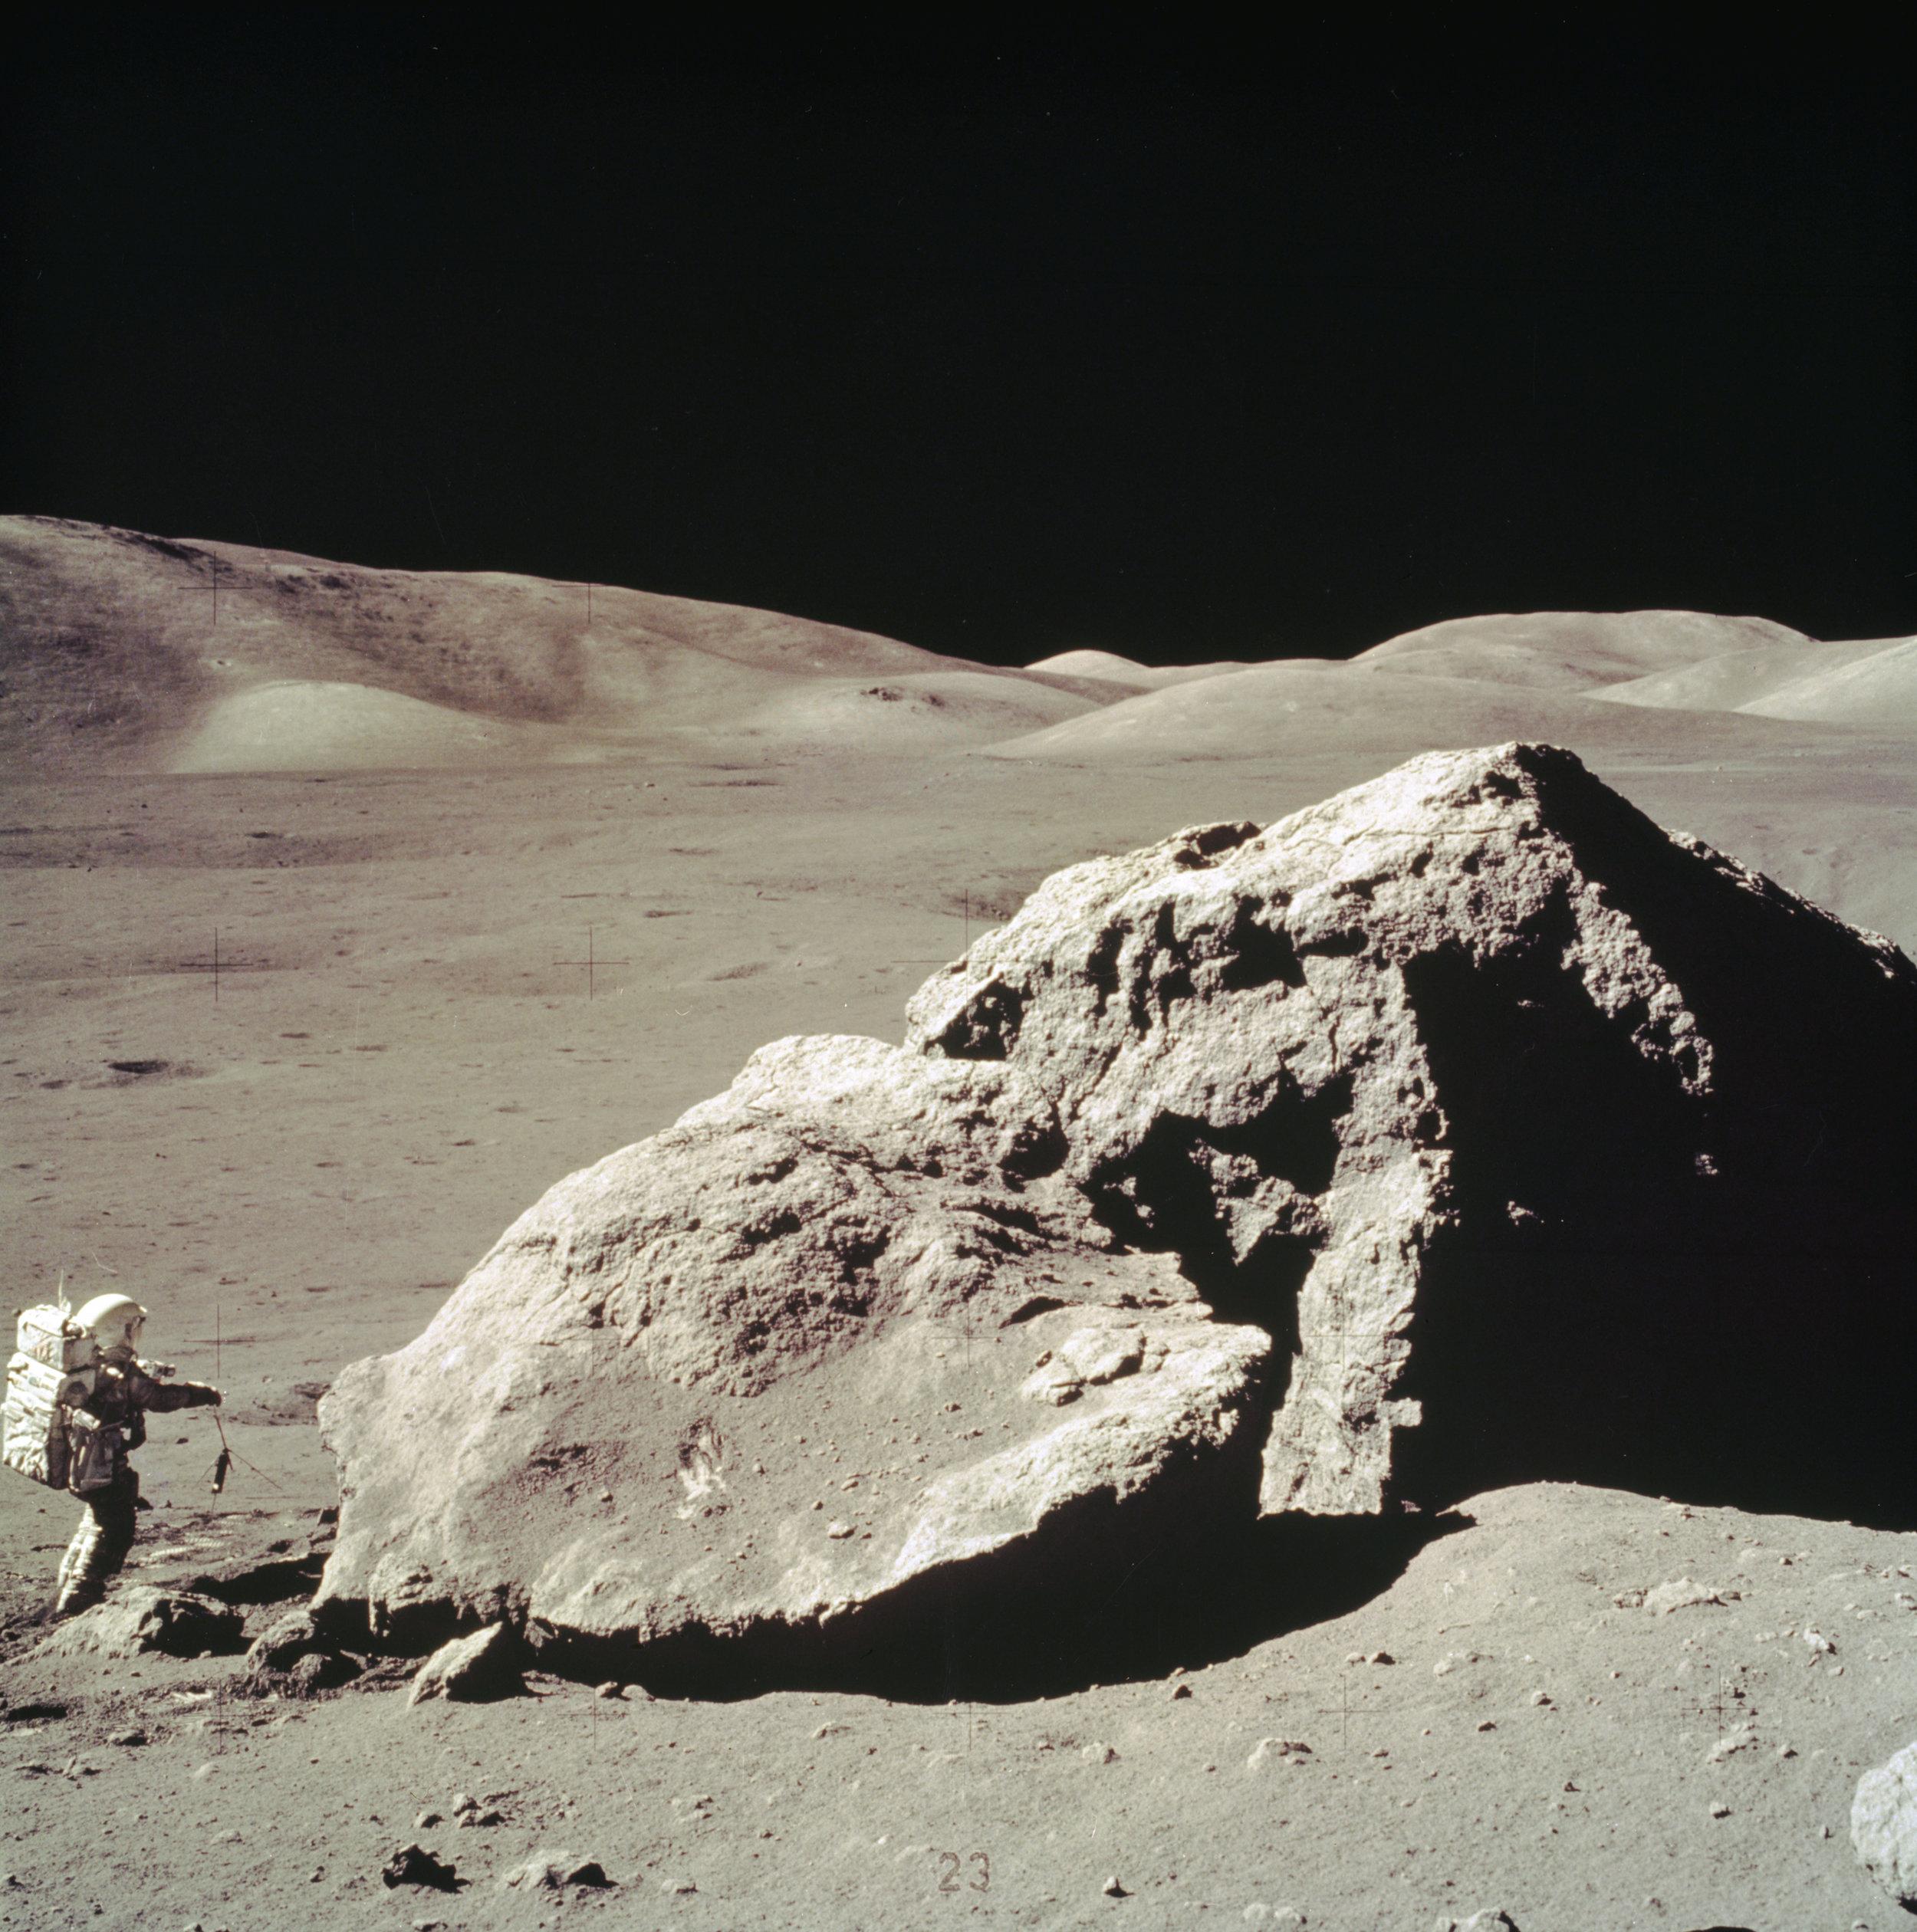 Apollo 17 Harrison H. Schmitt collects rock samples near the Taurus-Littrow Valley. Image credit: NASA/MSFC